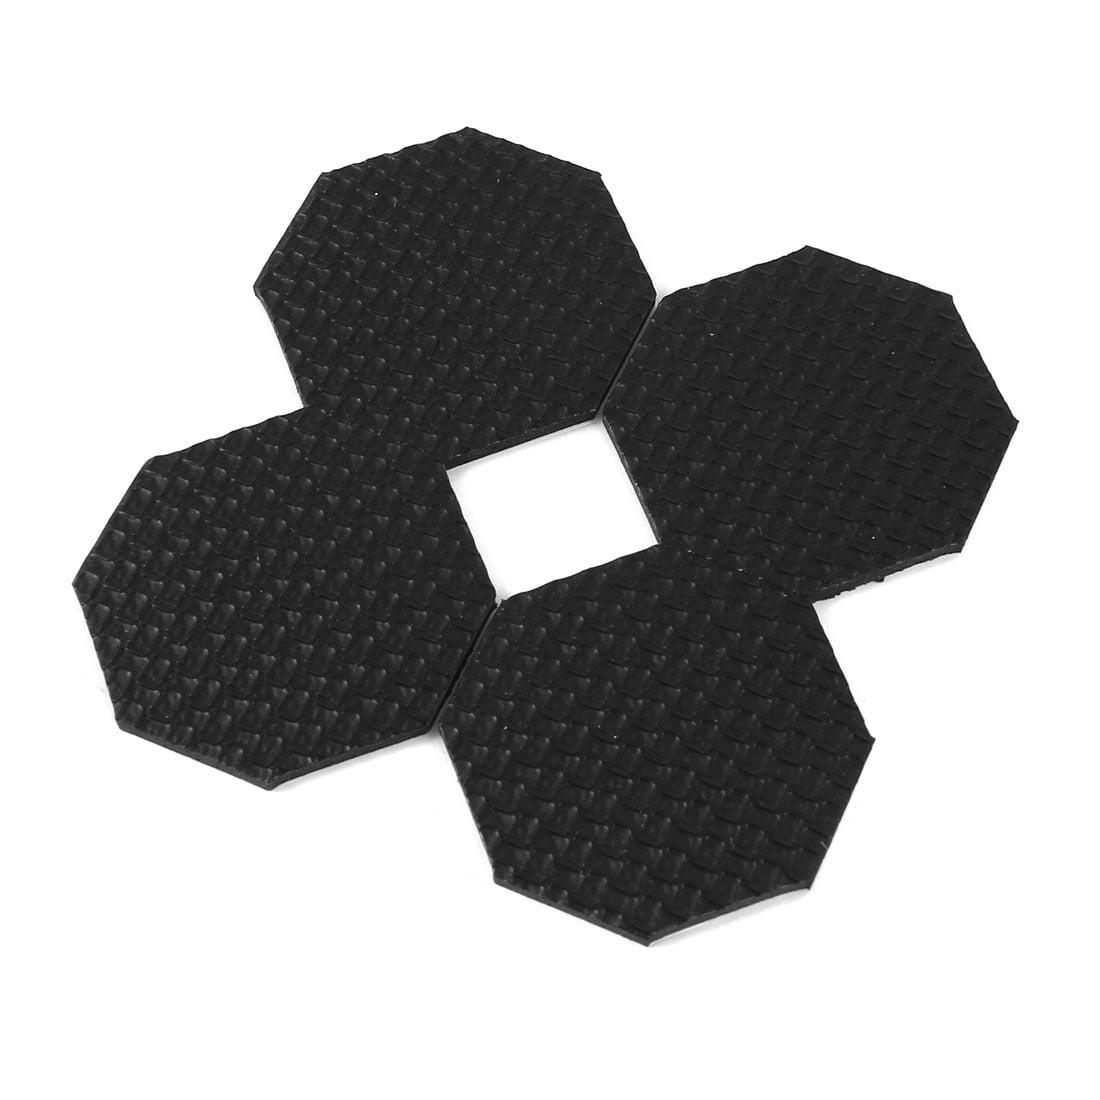 Unique Bargains 4 Pcs Antislip Foam Hexagon 2mm x 45mm Adhesive Chair Foot Cover Table Furniture Leg Protector Balck